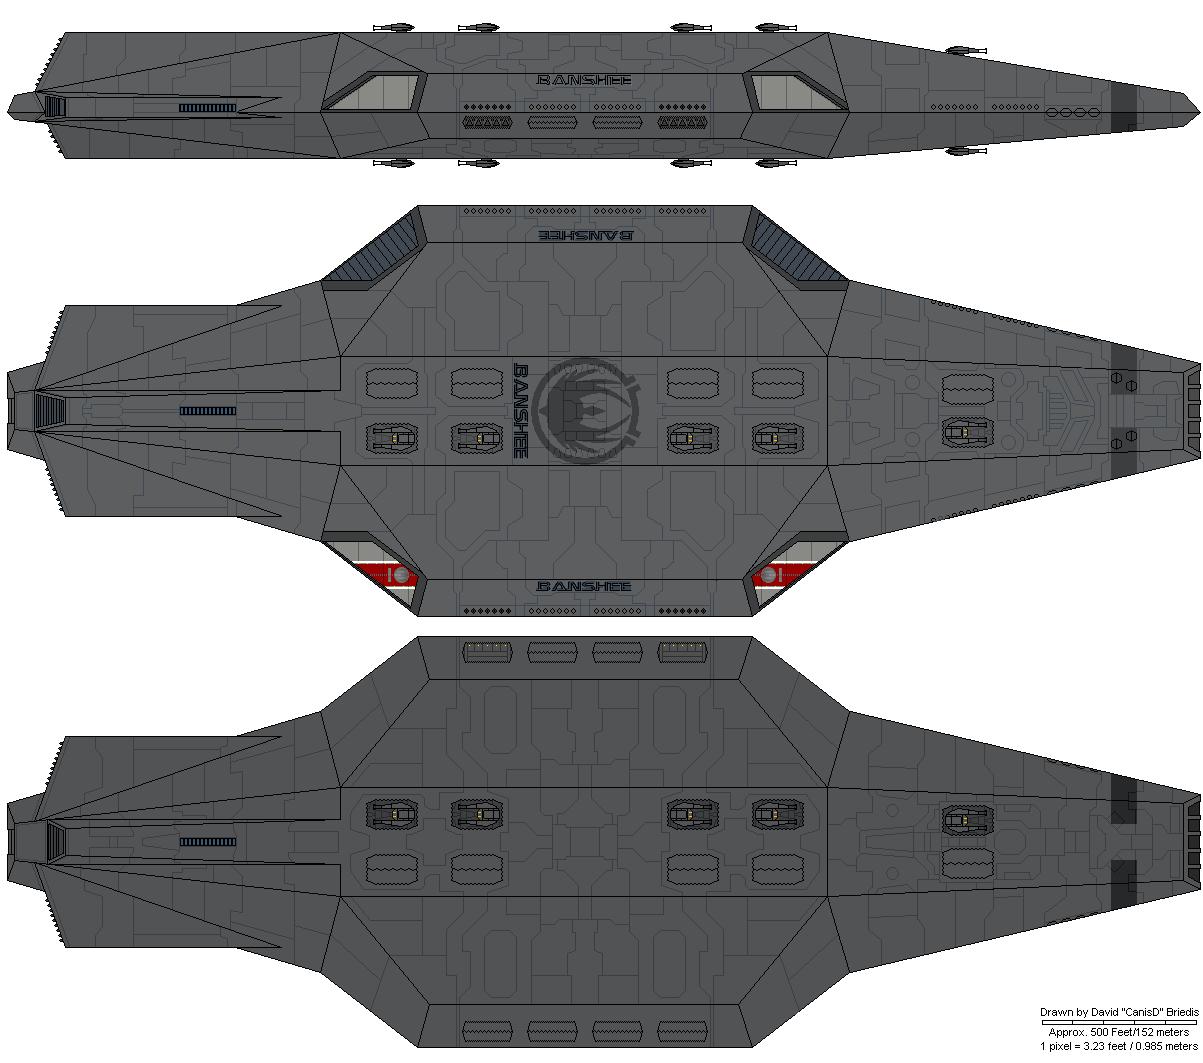 1000+ images about Battlestar Galactica on Pinterest ...  |Battlestar Galactica Spacecraft